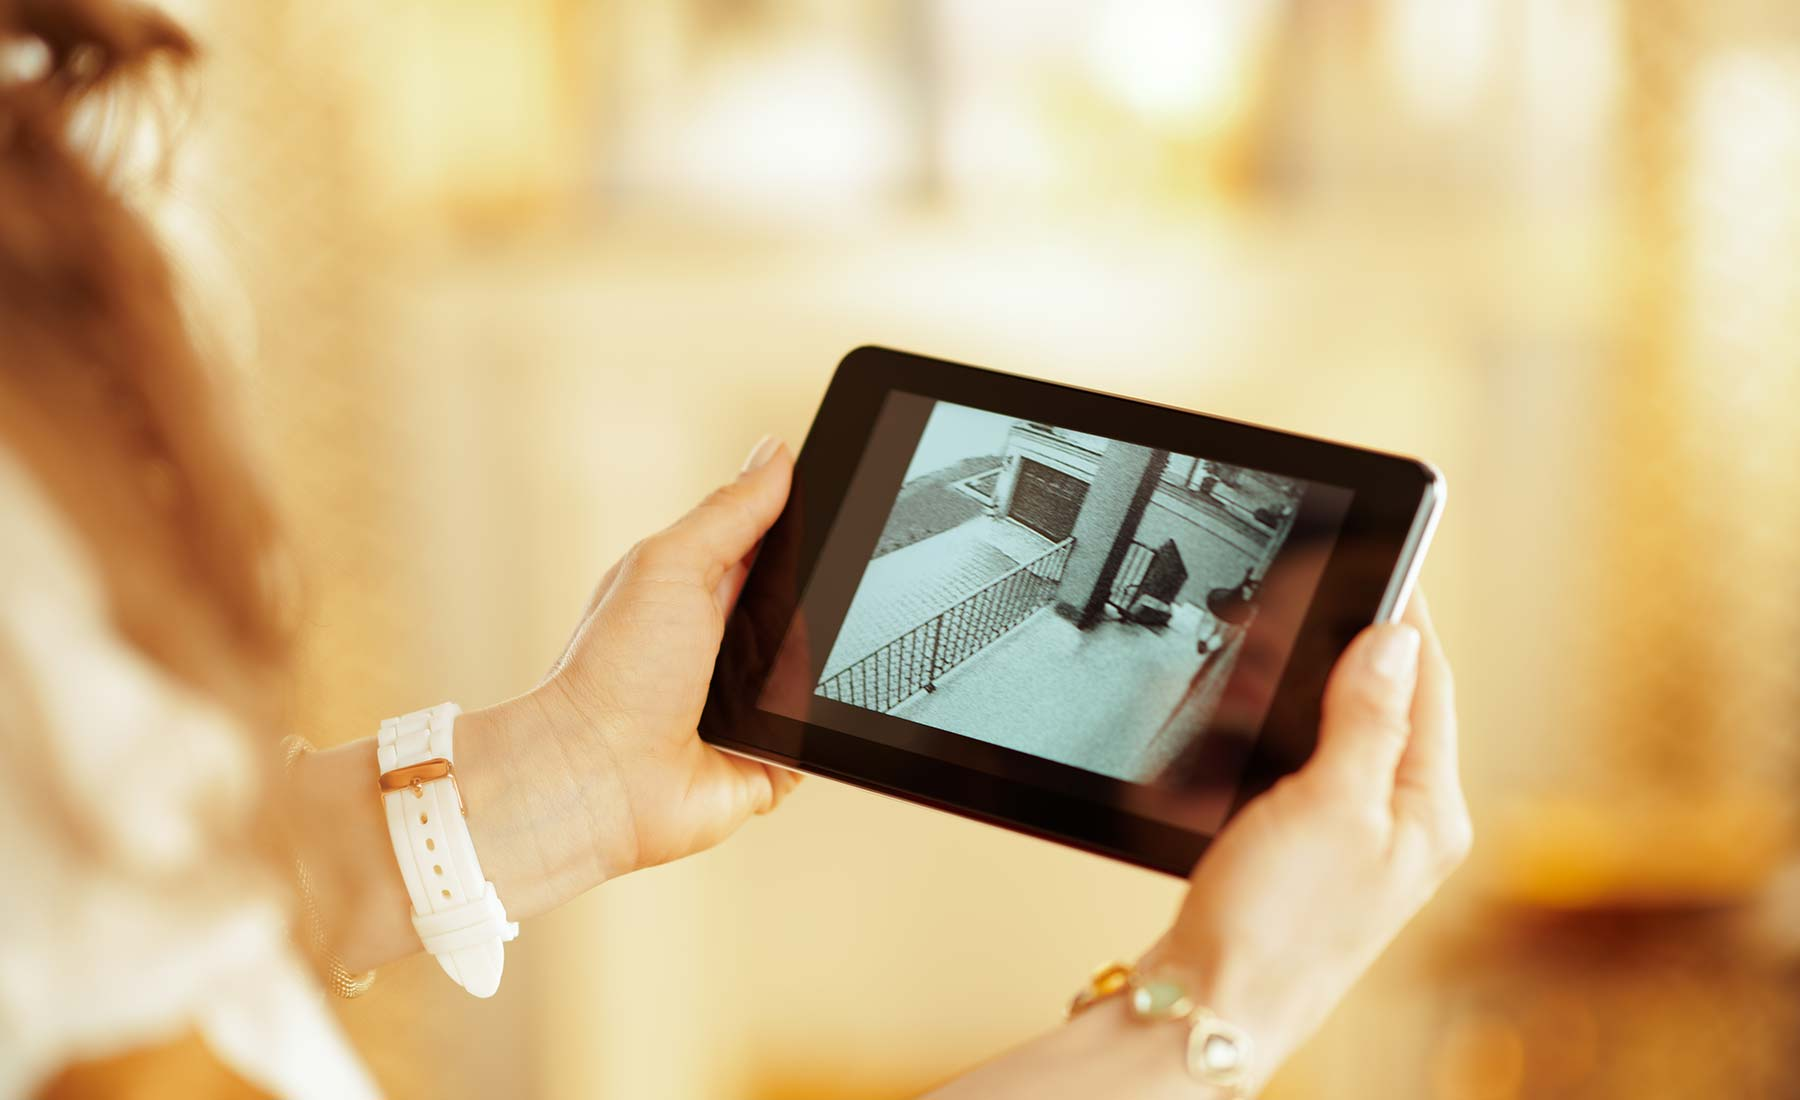 Video surveillance on tablet